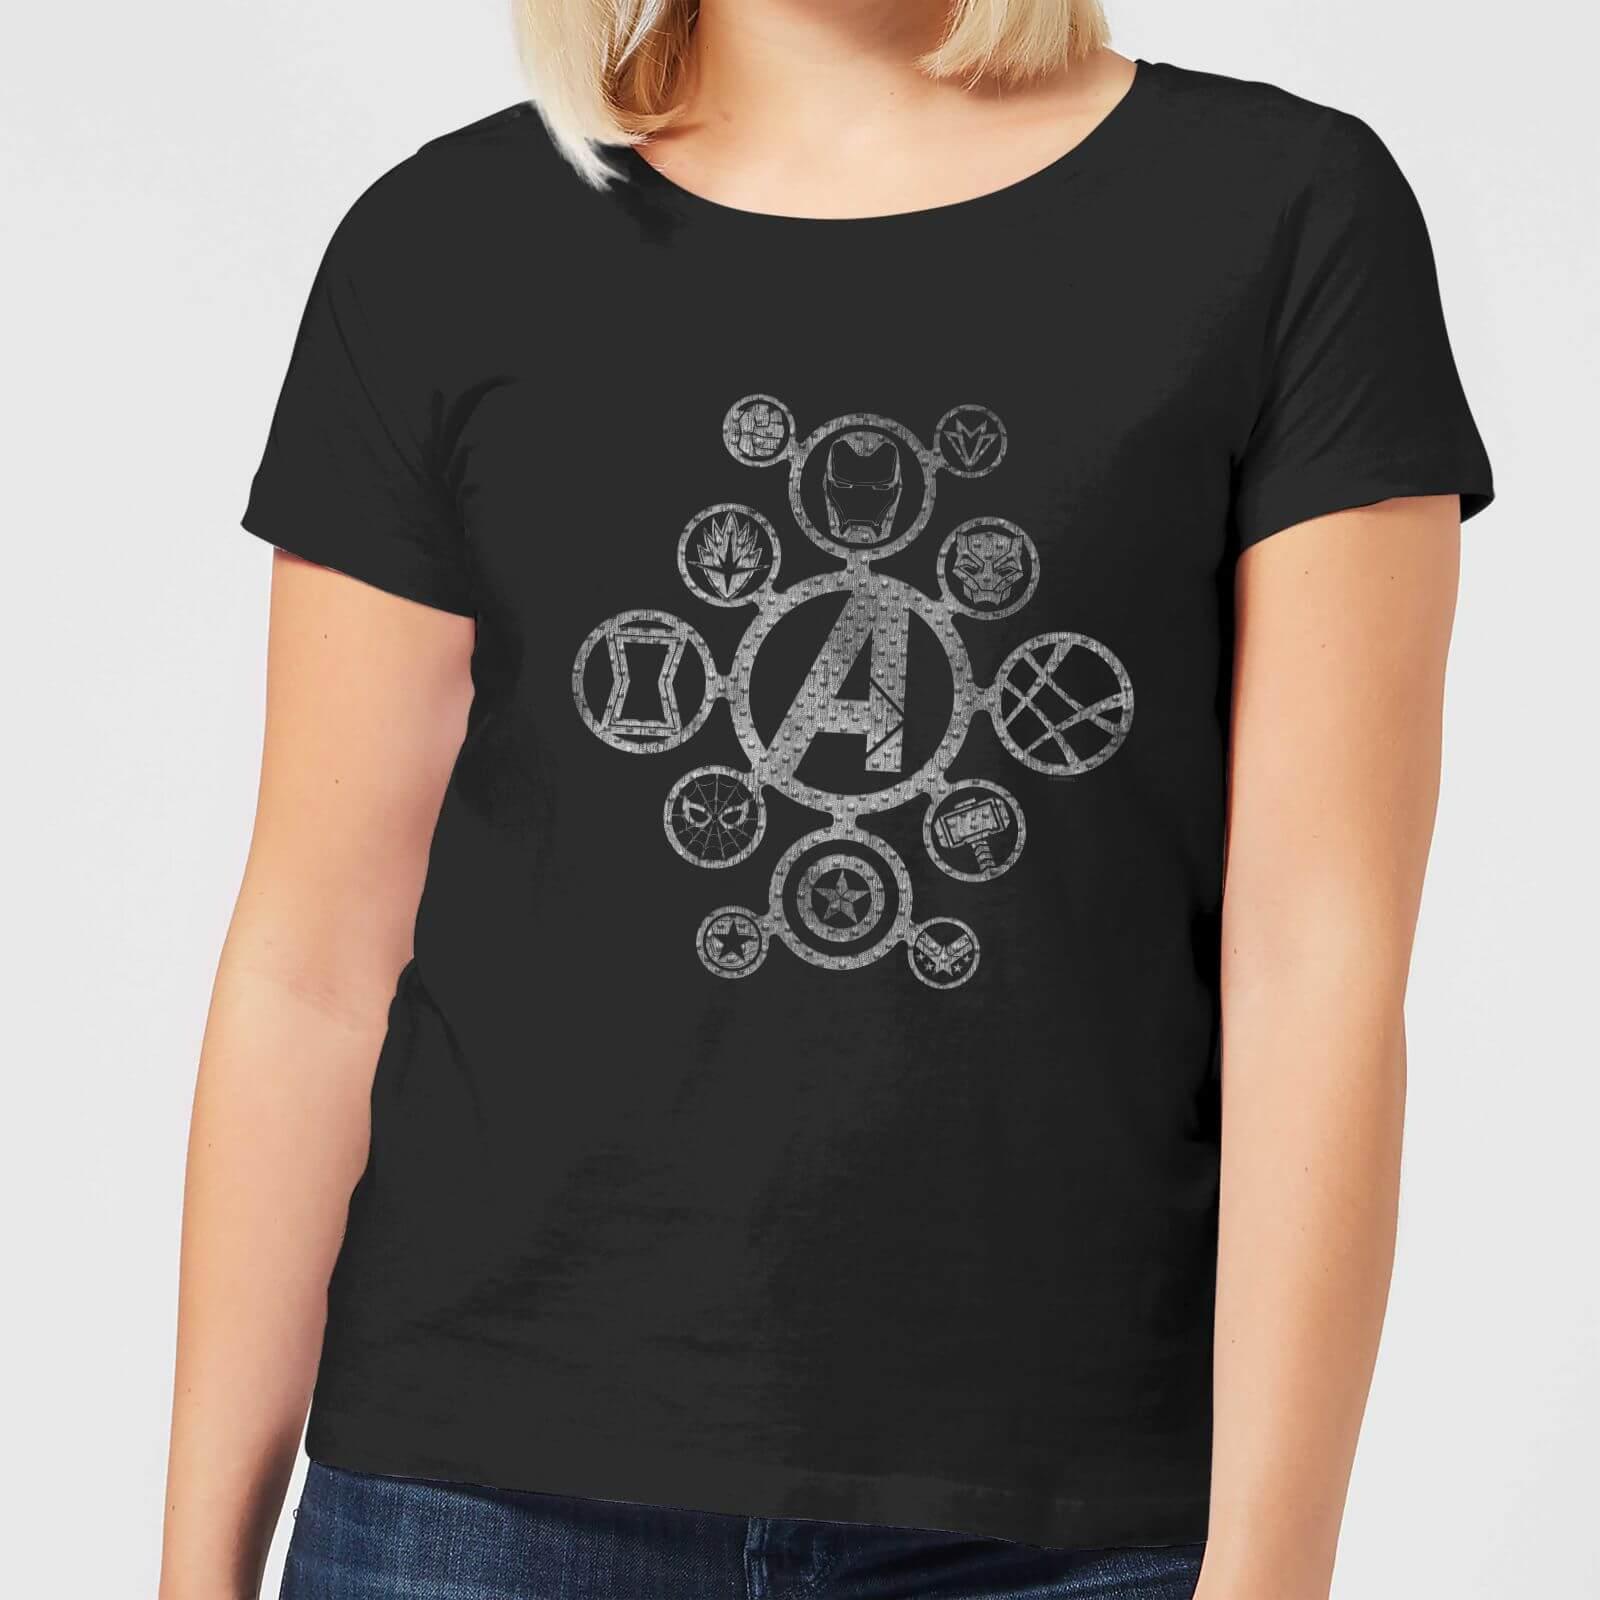 Marvel Avengers Distressed Metal Icon Women's T-Shirt - Black - L - Black